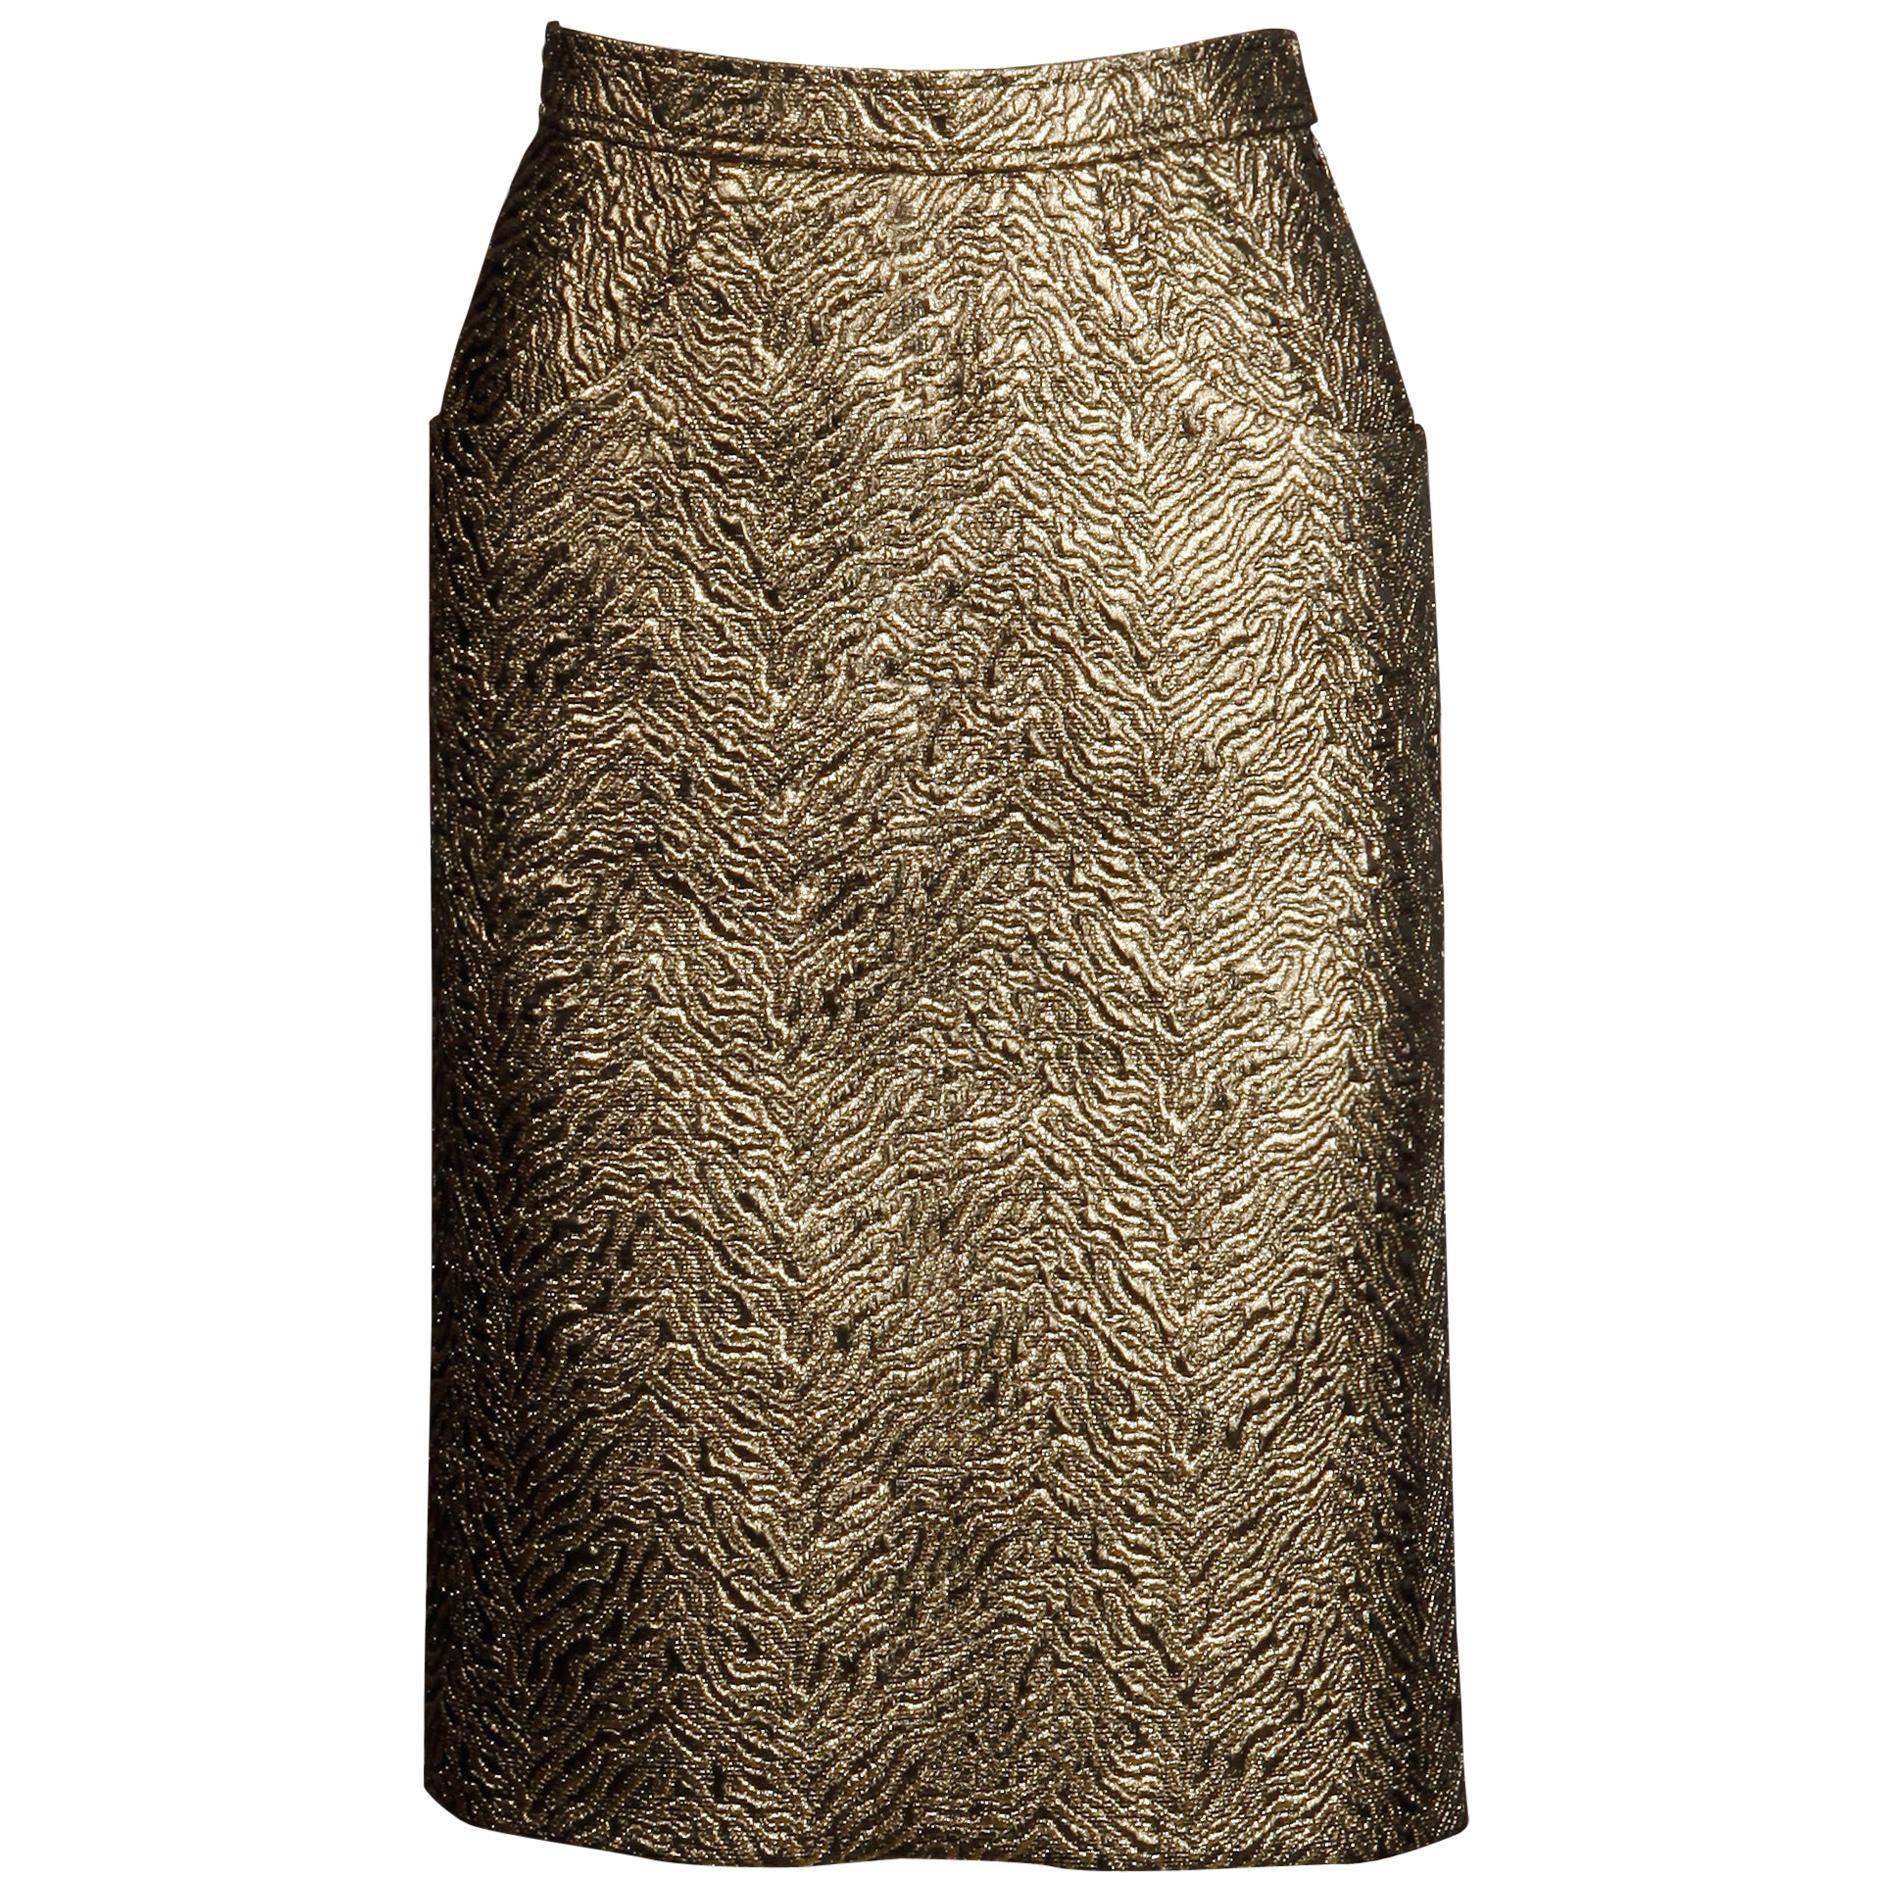 1980s Yves Saint Laurent Rive Gauche Vintage Quilted Metallic Gold Pencil Skirt